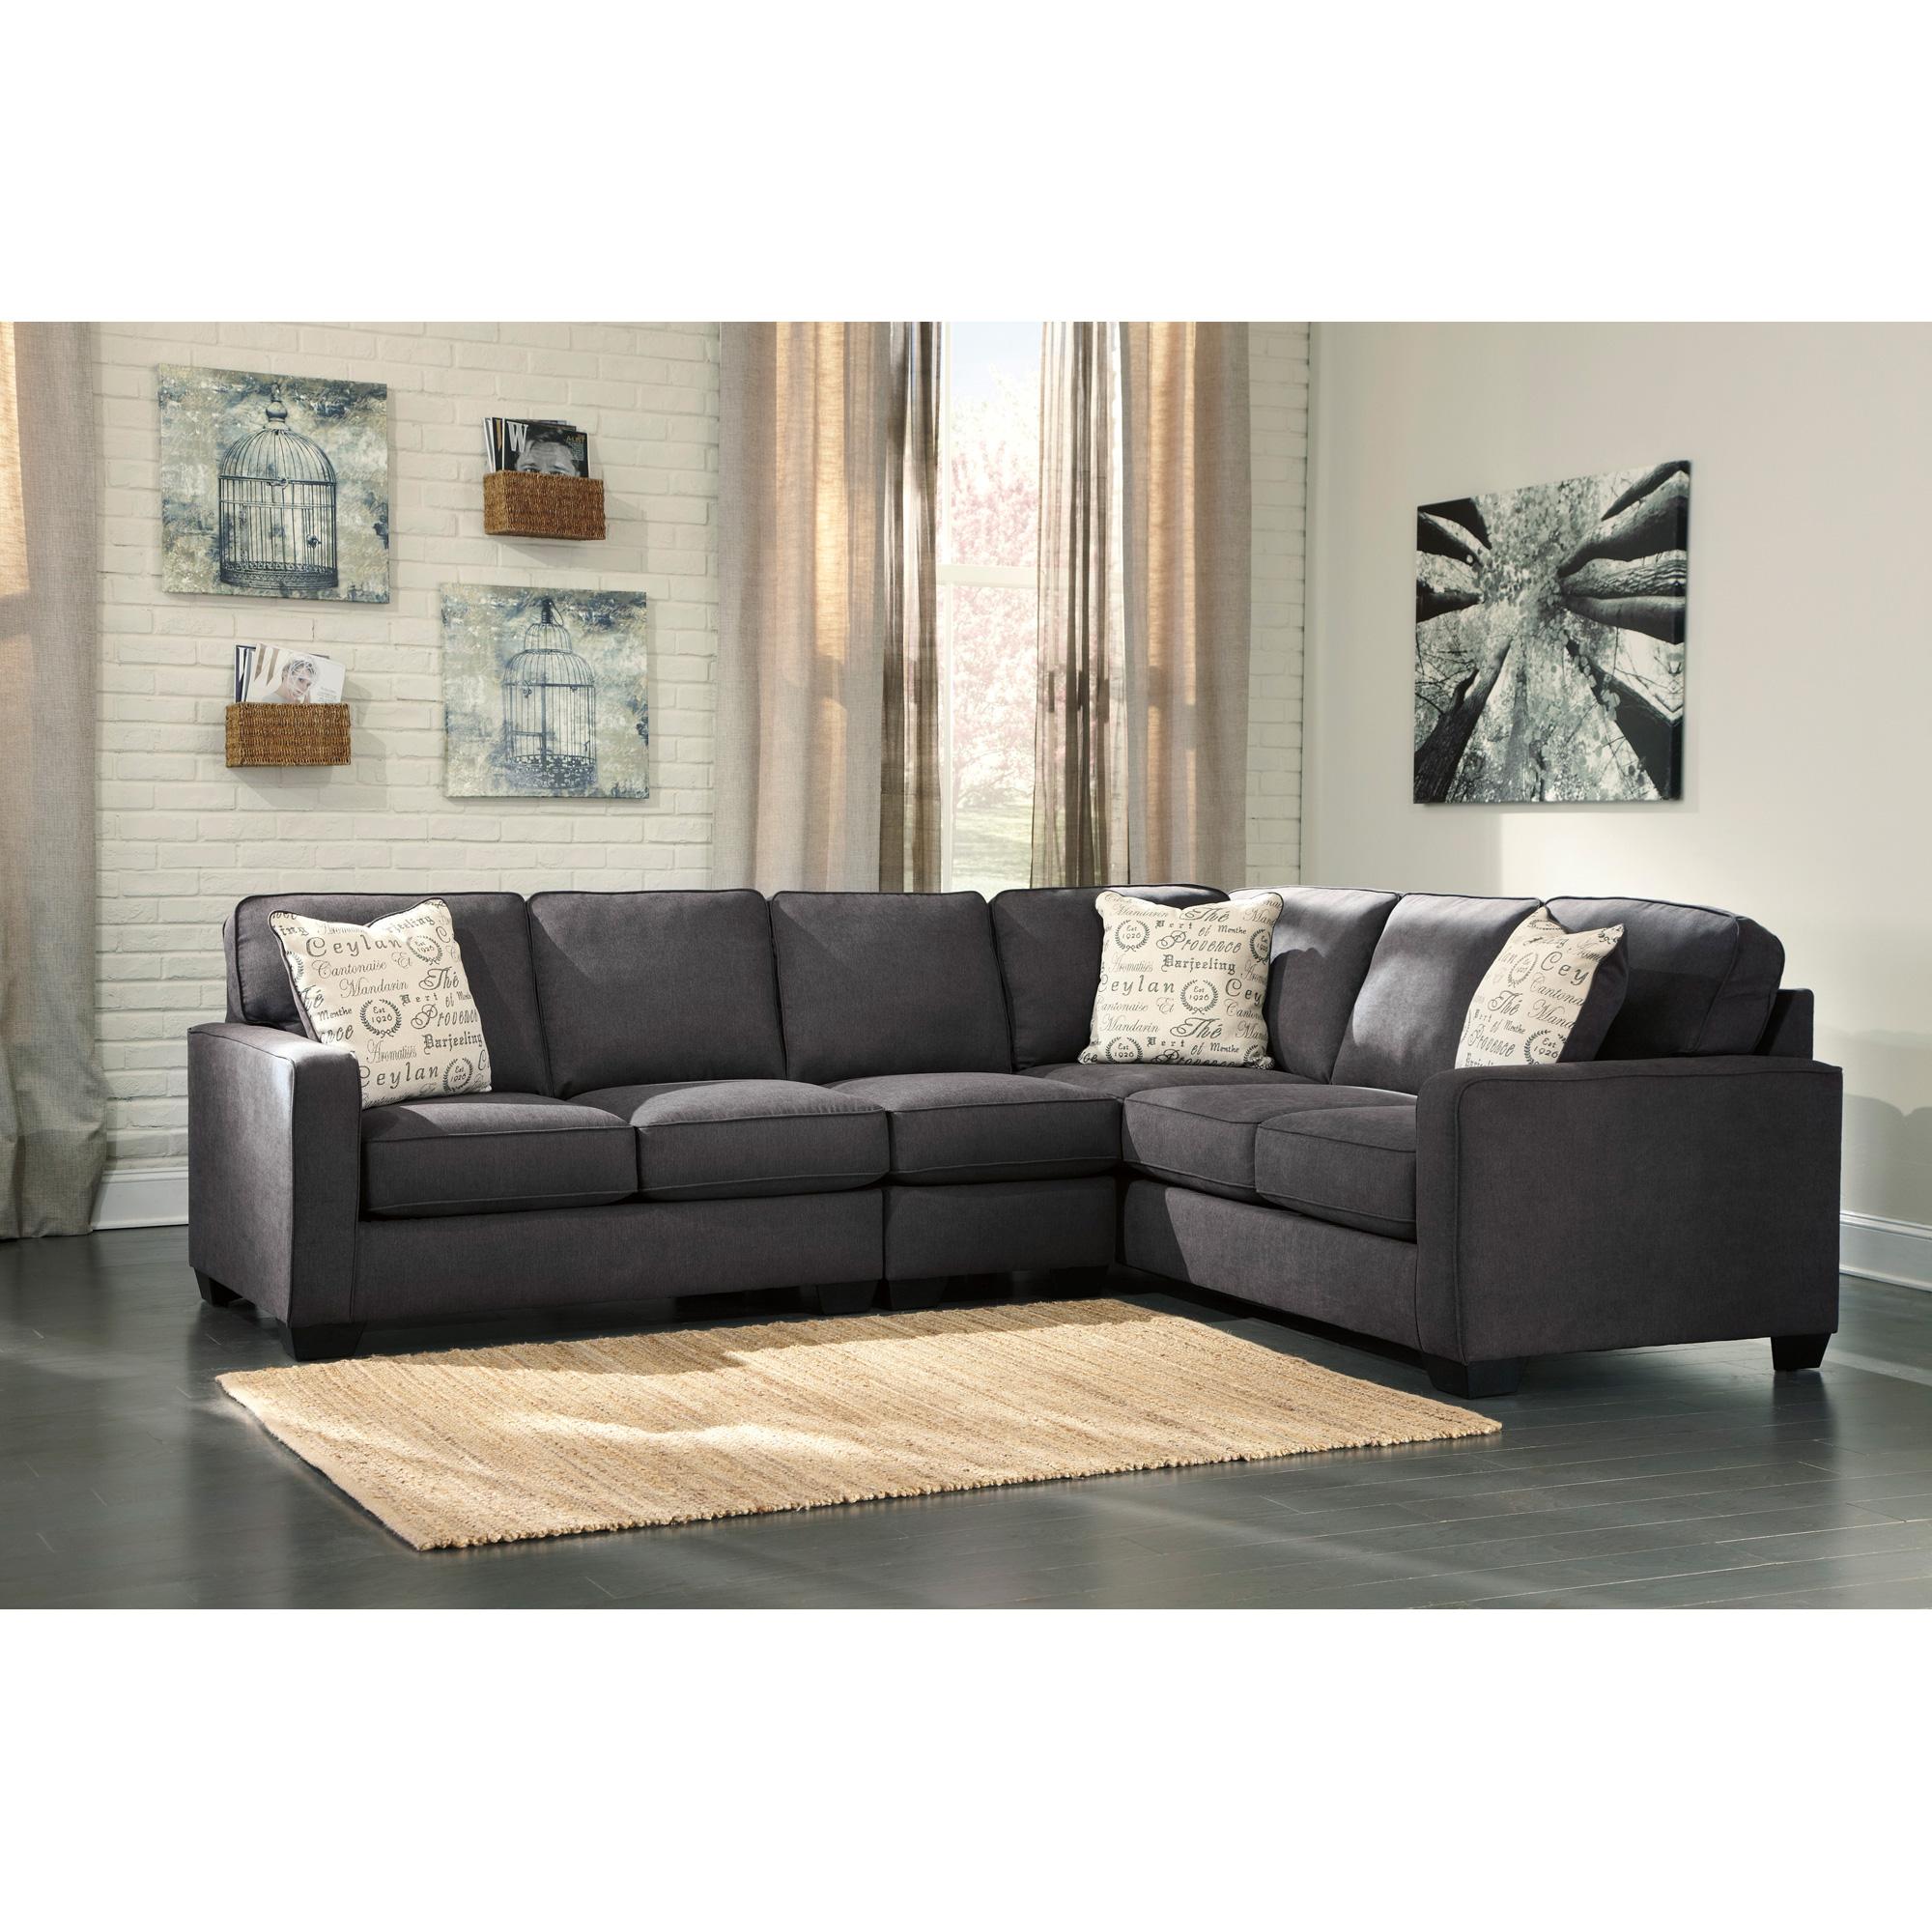 Ashley Furniture | Alenya Charcoal 3 Piece Left Sectional Sofa